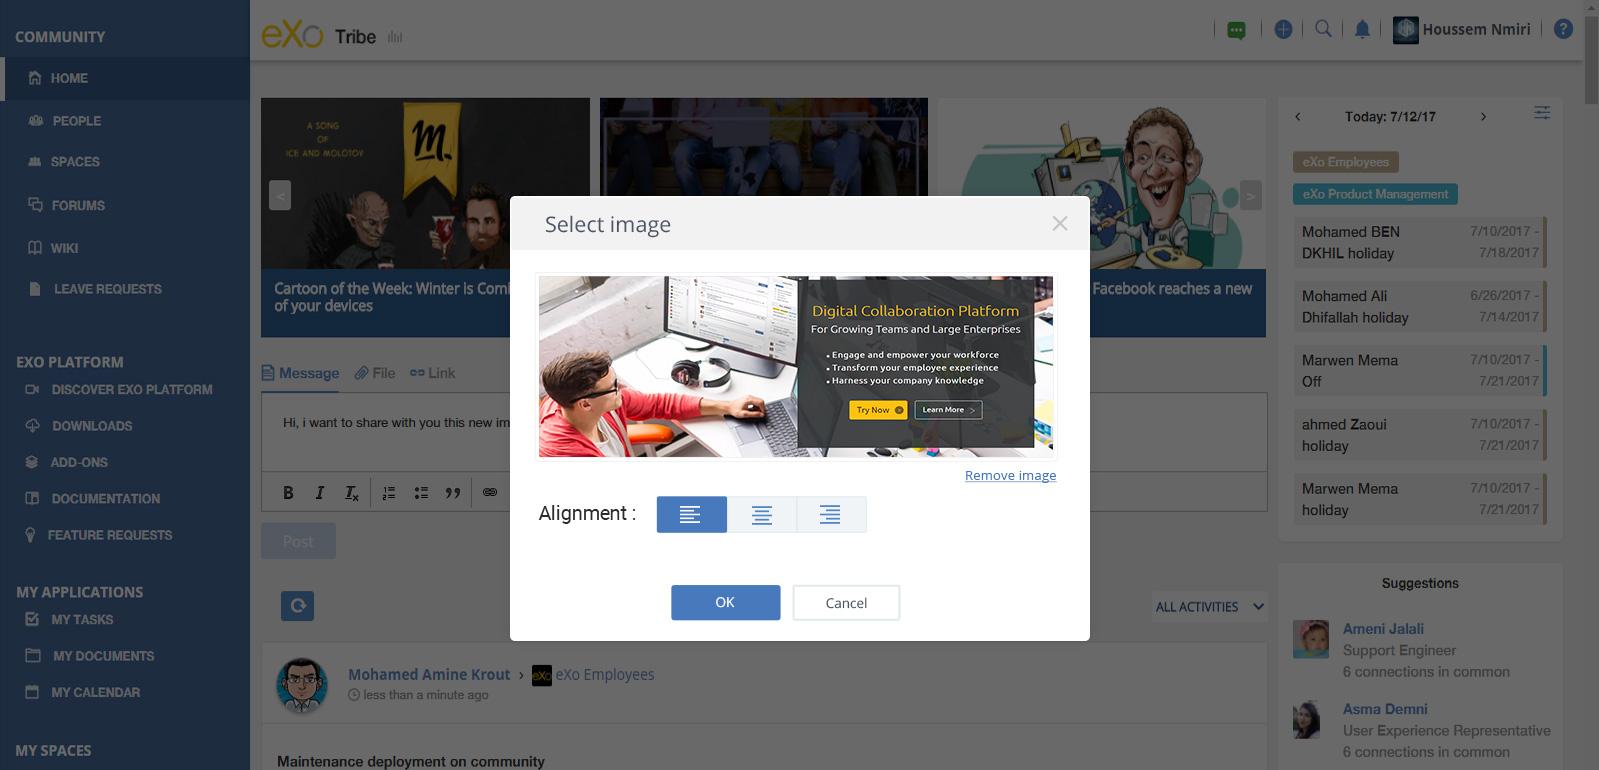 upload image in corporate microblogging